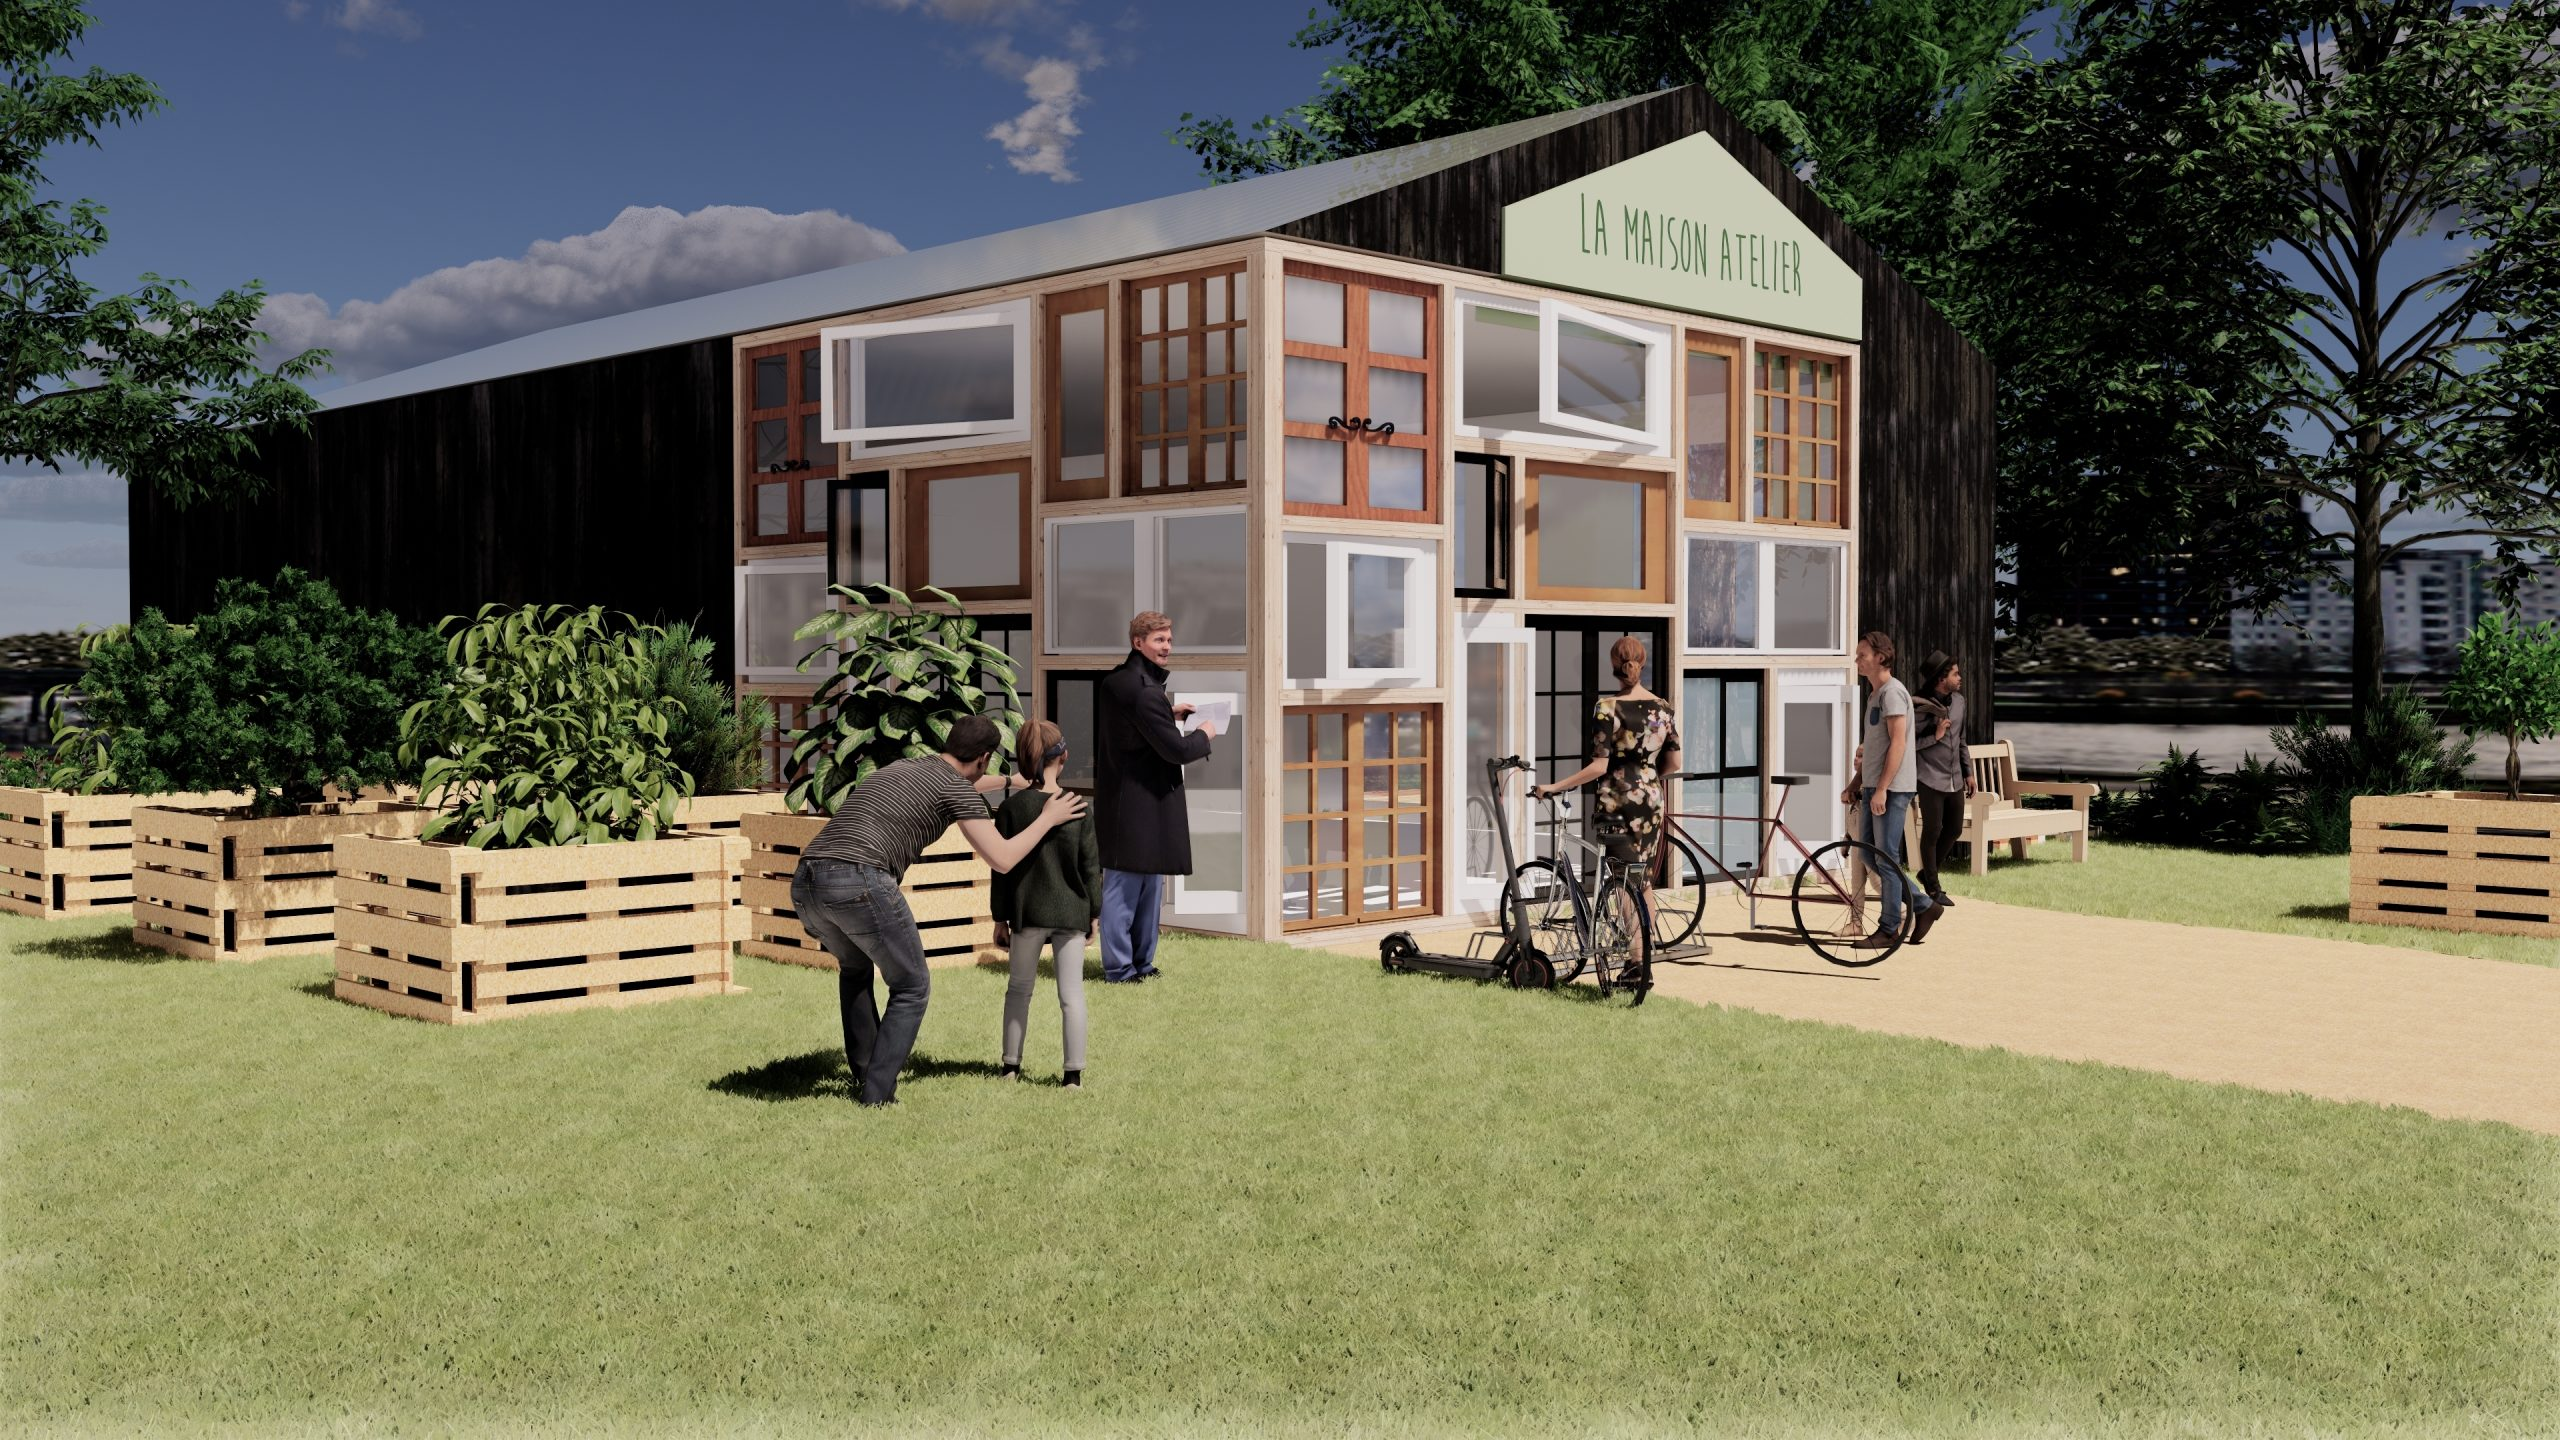 eco-lieu-urbain-esprit-cabane-maison-jardin